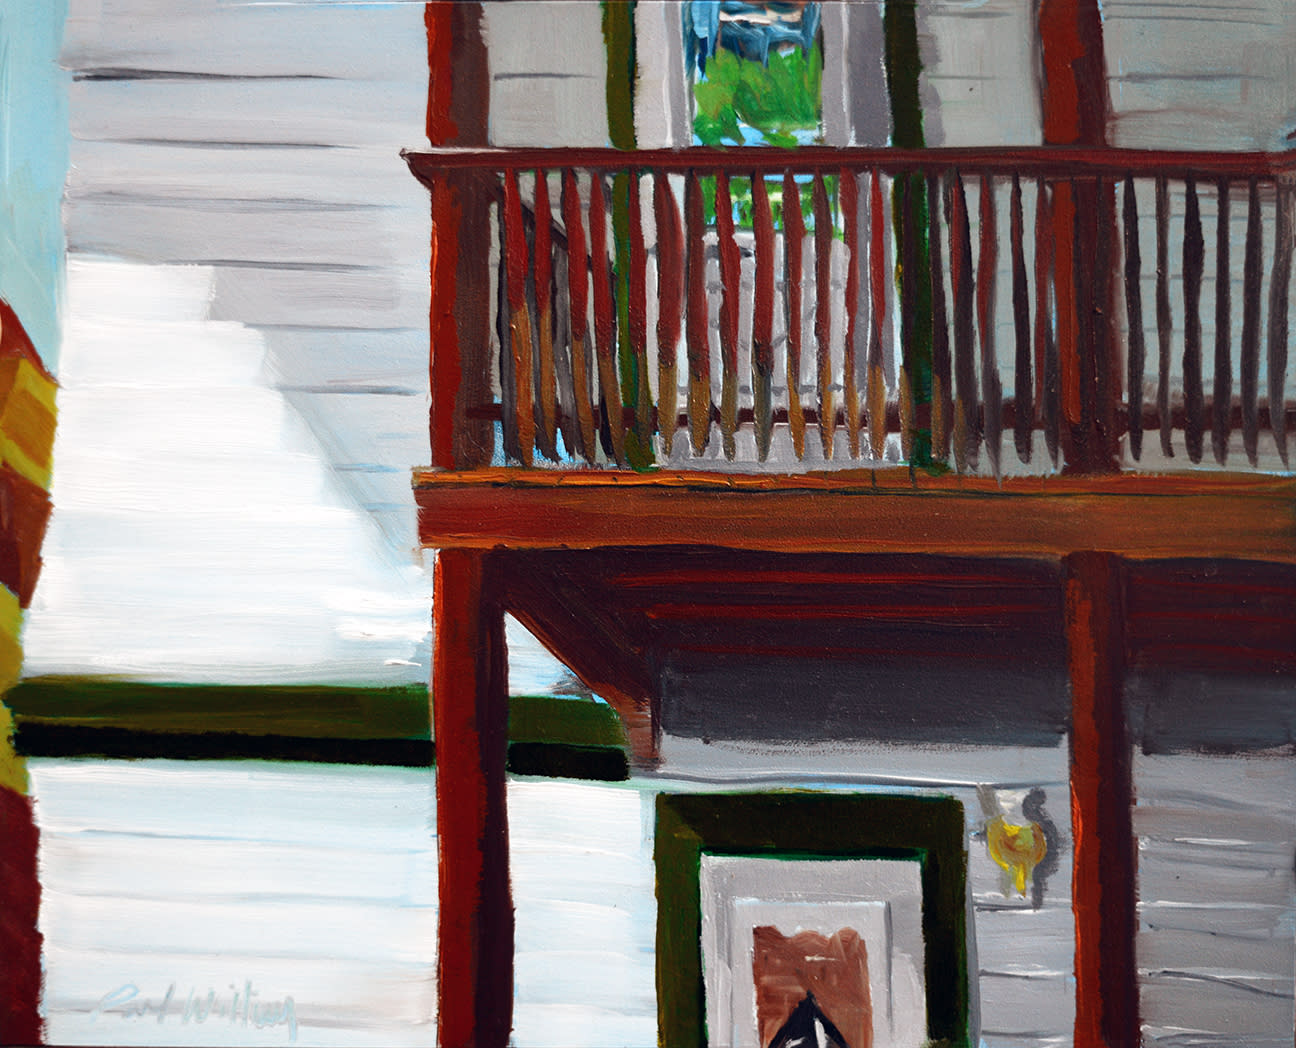 Somerville back deck by paul william cf2lpn